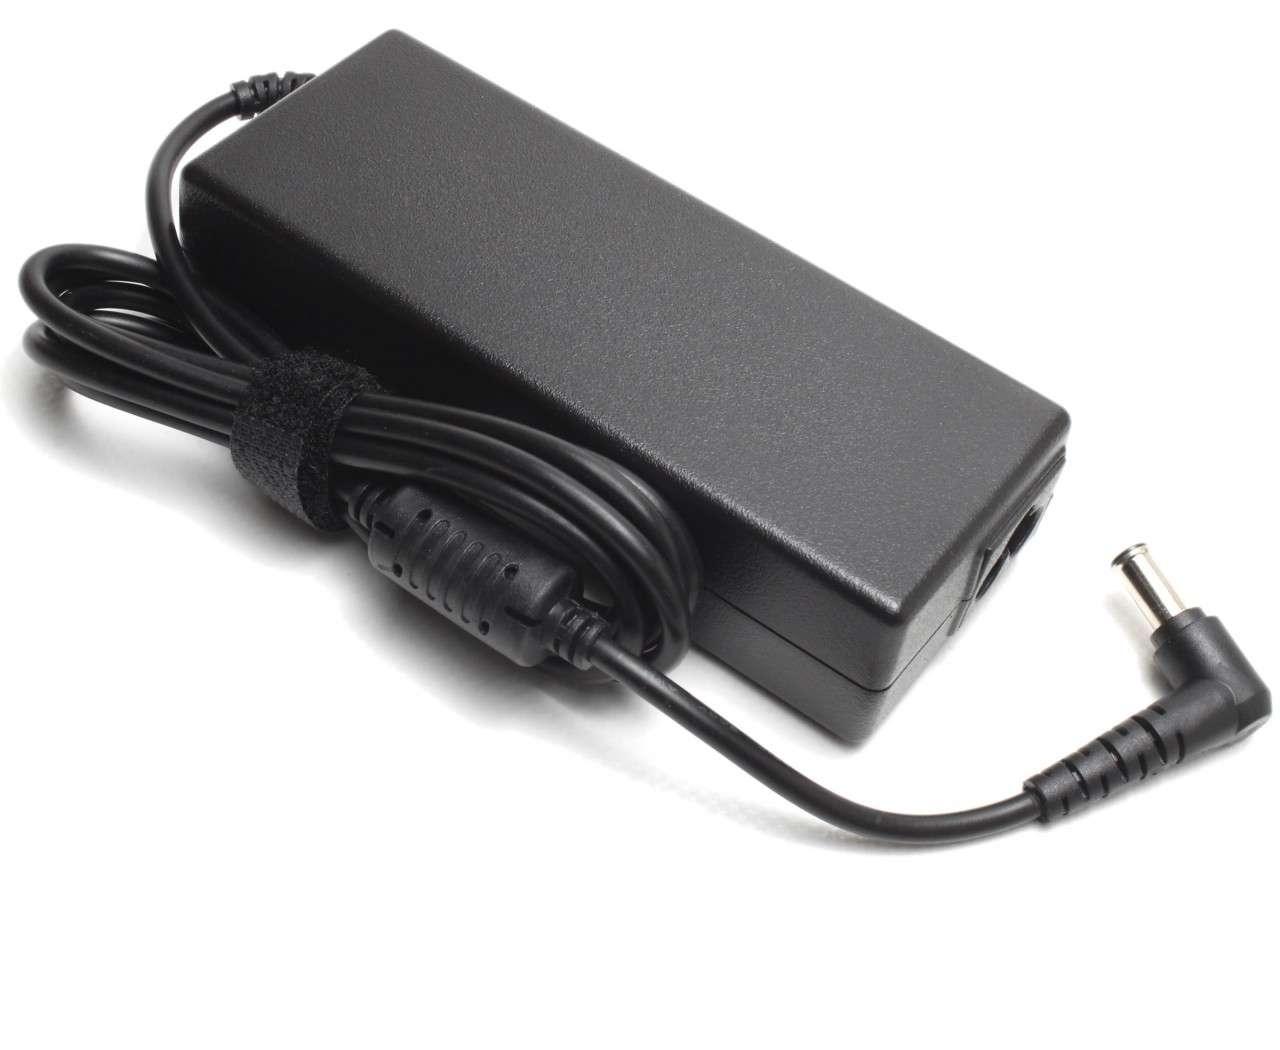 Incarcator Sony Vaio VGN CS21 Replacement imagine powerlaptop.ro 2021